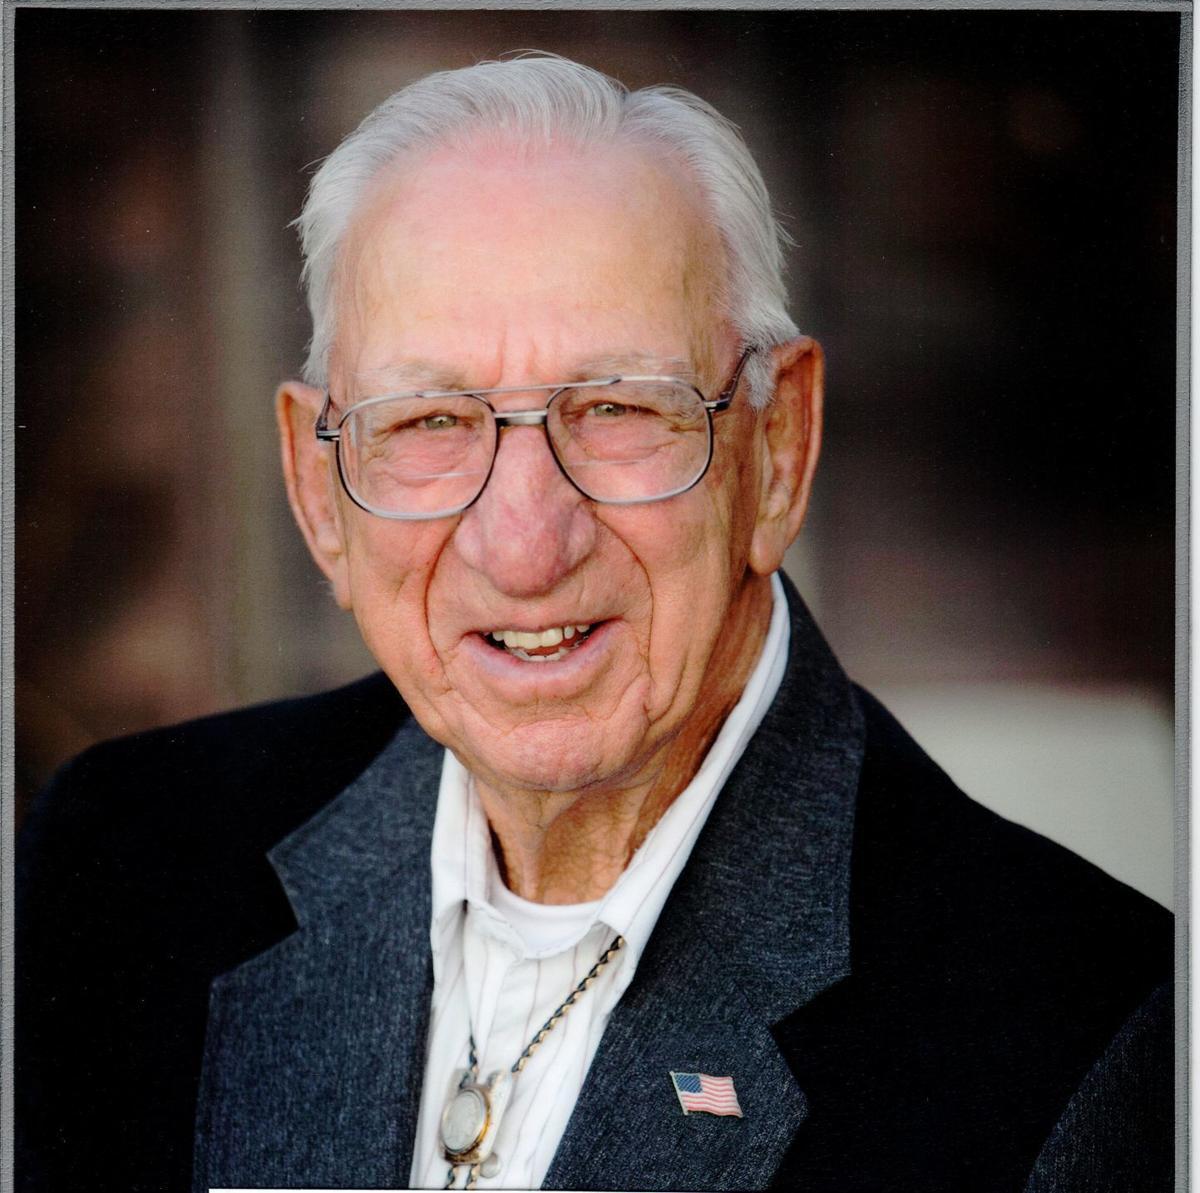 Twitchell to celebrate 90th birthday